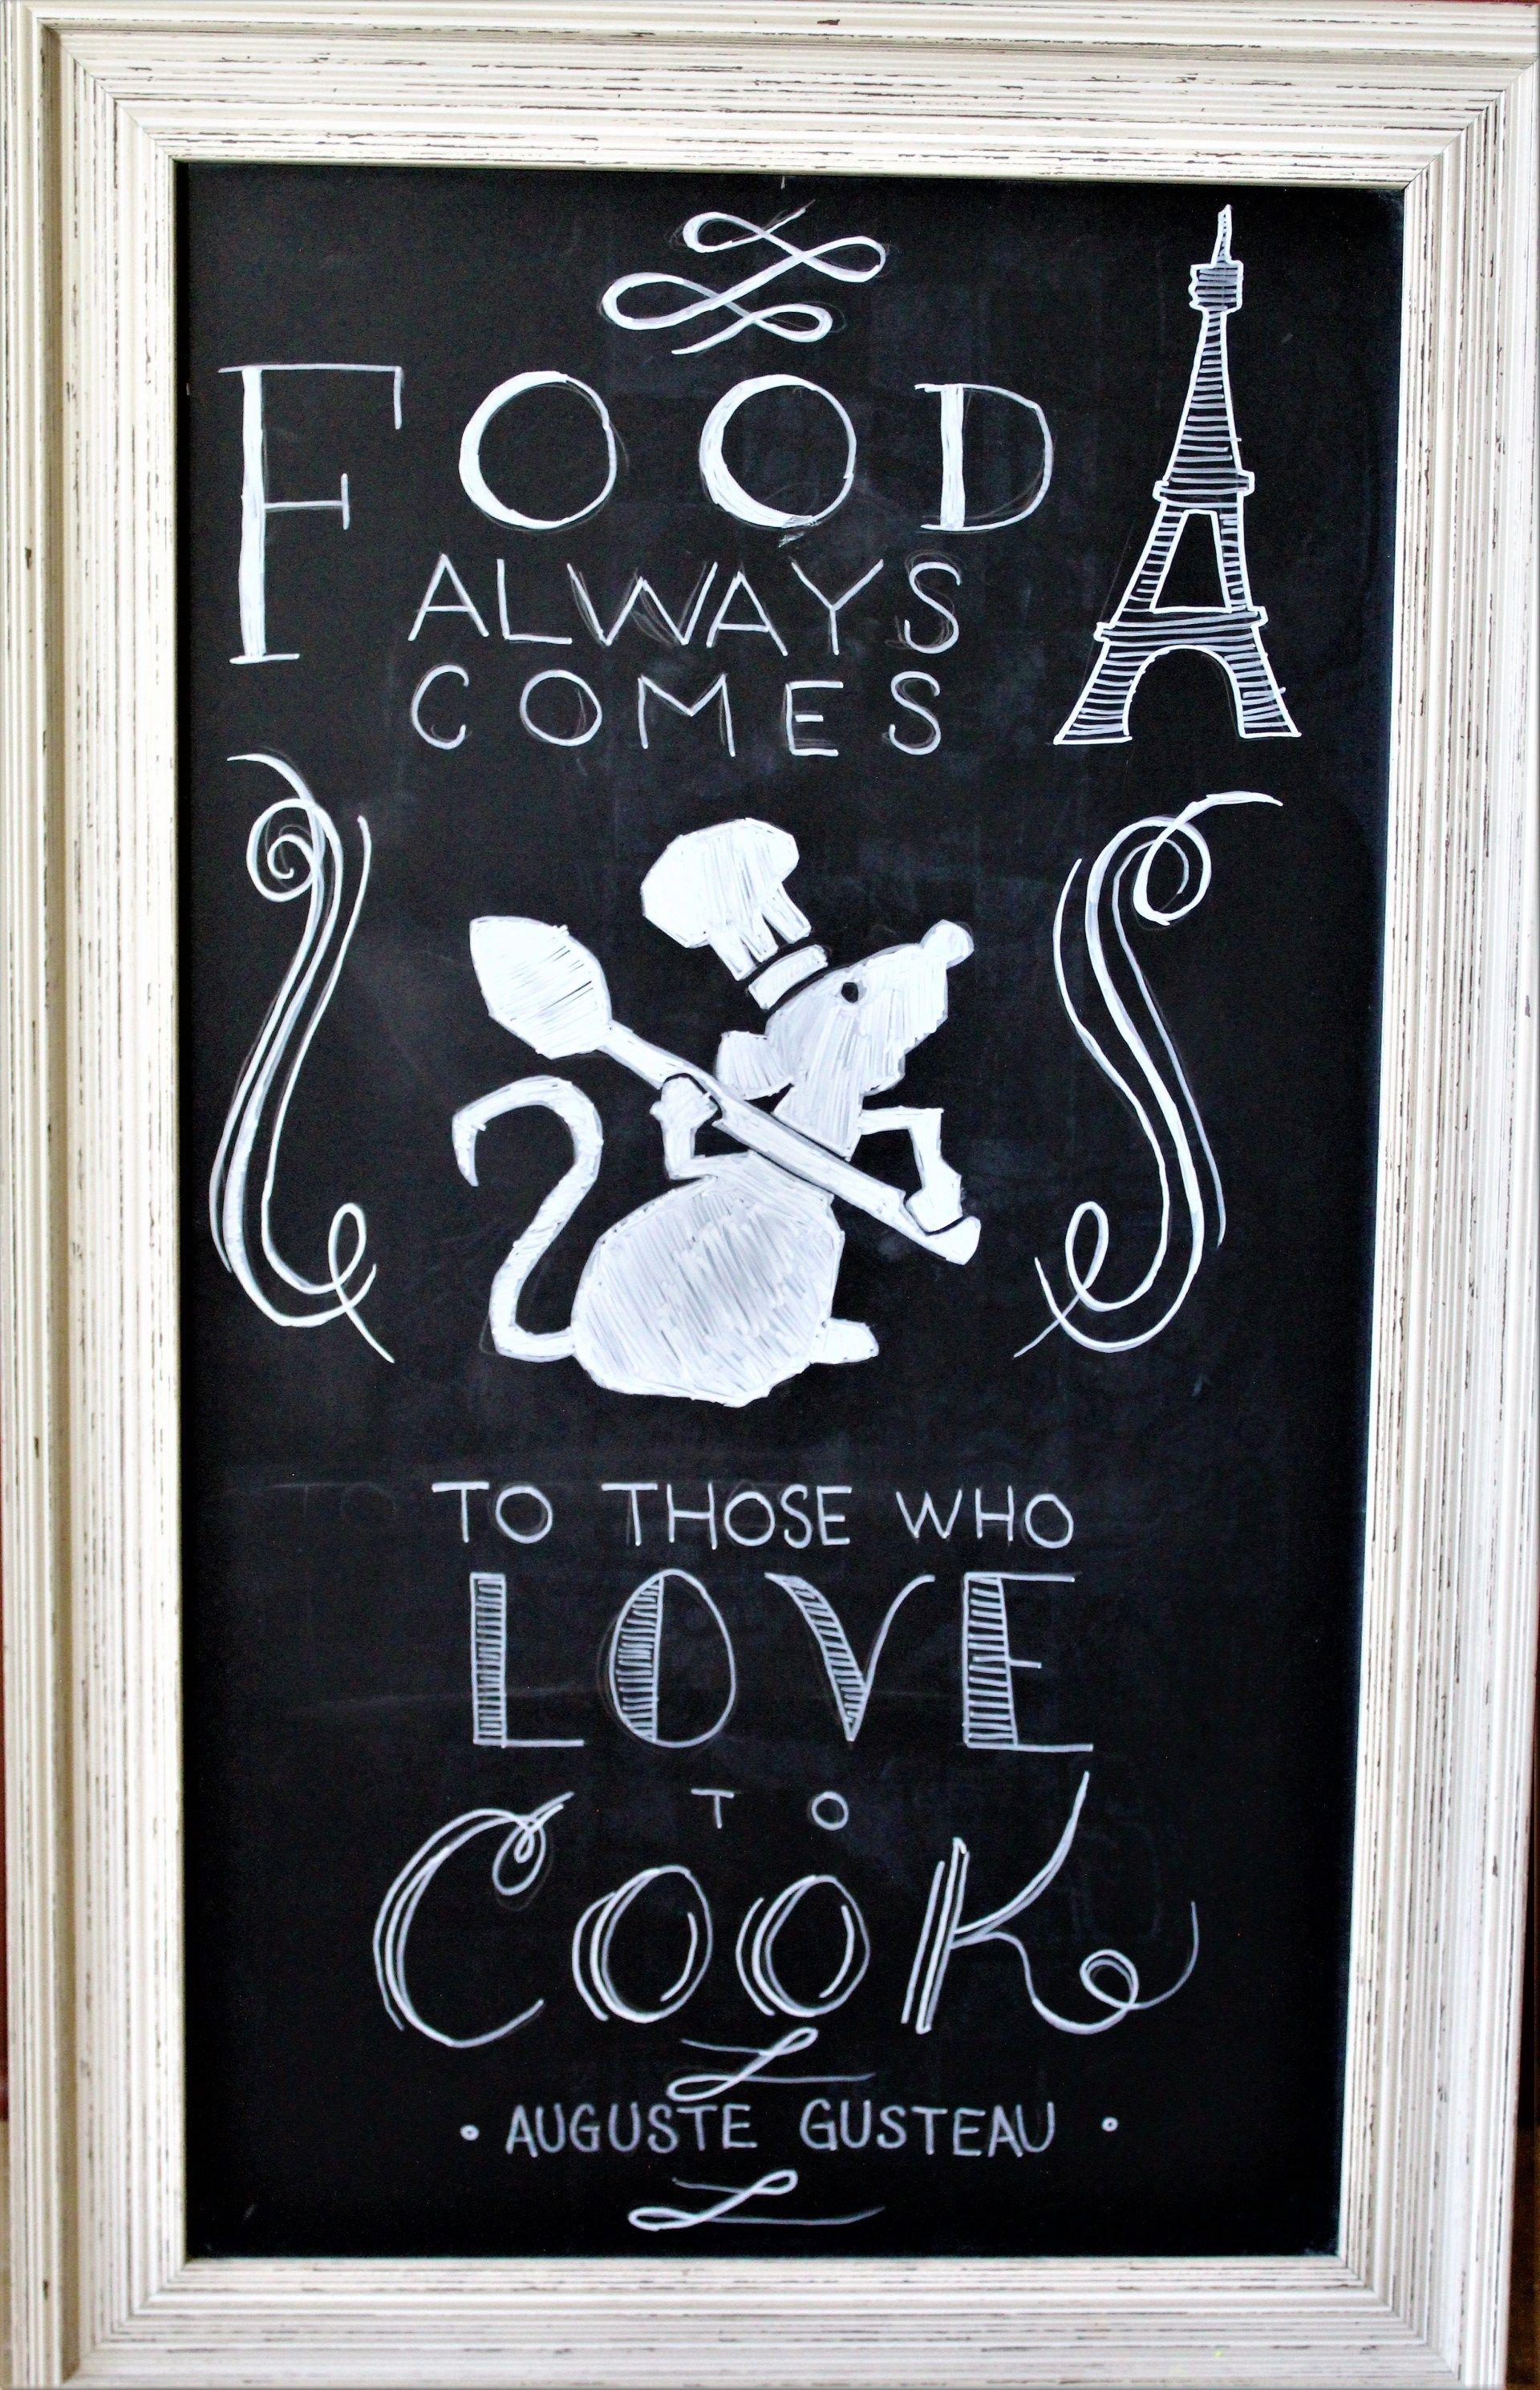 Ratatouille Chalkboard Art For The Kitchen The Healthy Mouse Disney Decor Disney Kitchen Decor Disney Home Decor